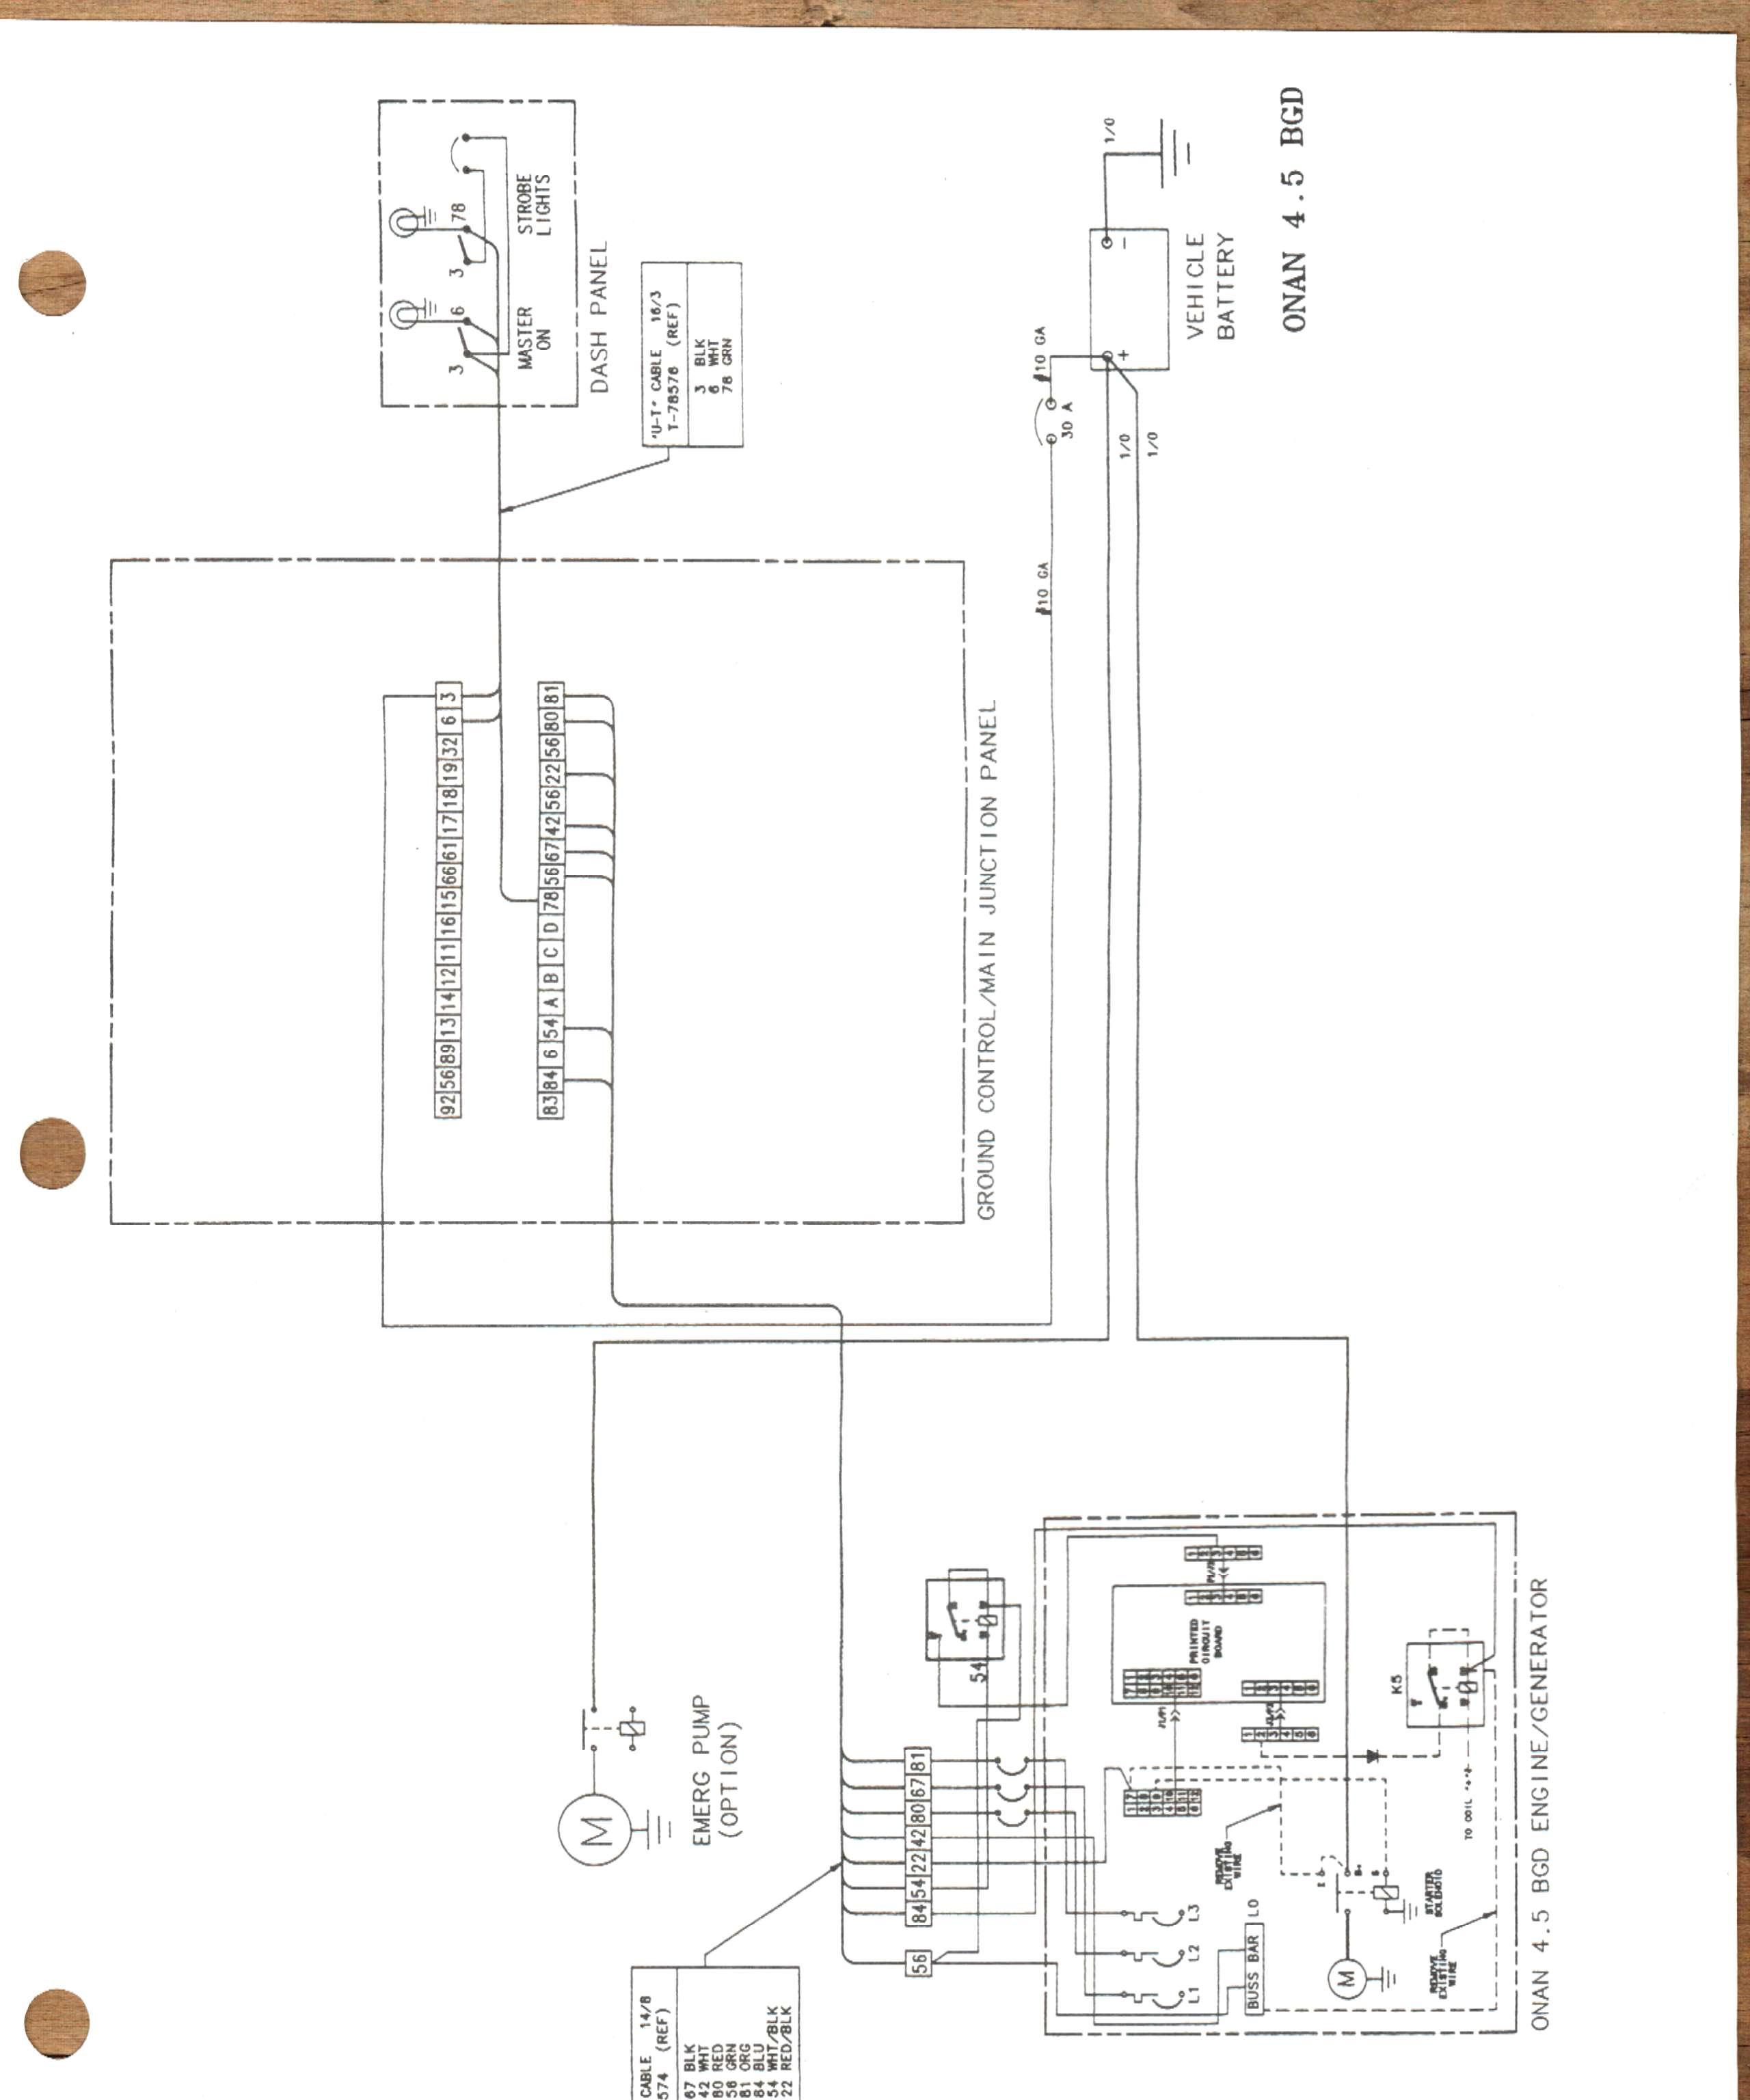 altec bucket truck wiring new forestry bucket trucks Vertical Wheelchair Lift Wiring Diagram for Relay Headlight Wiring Diagram International